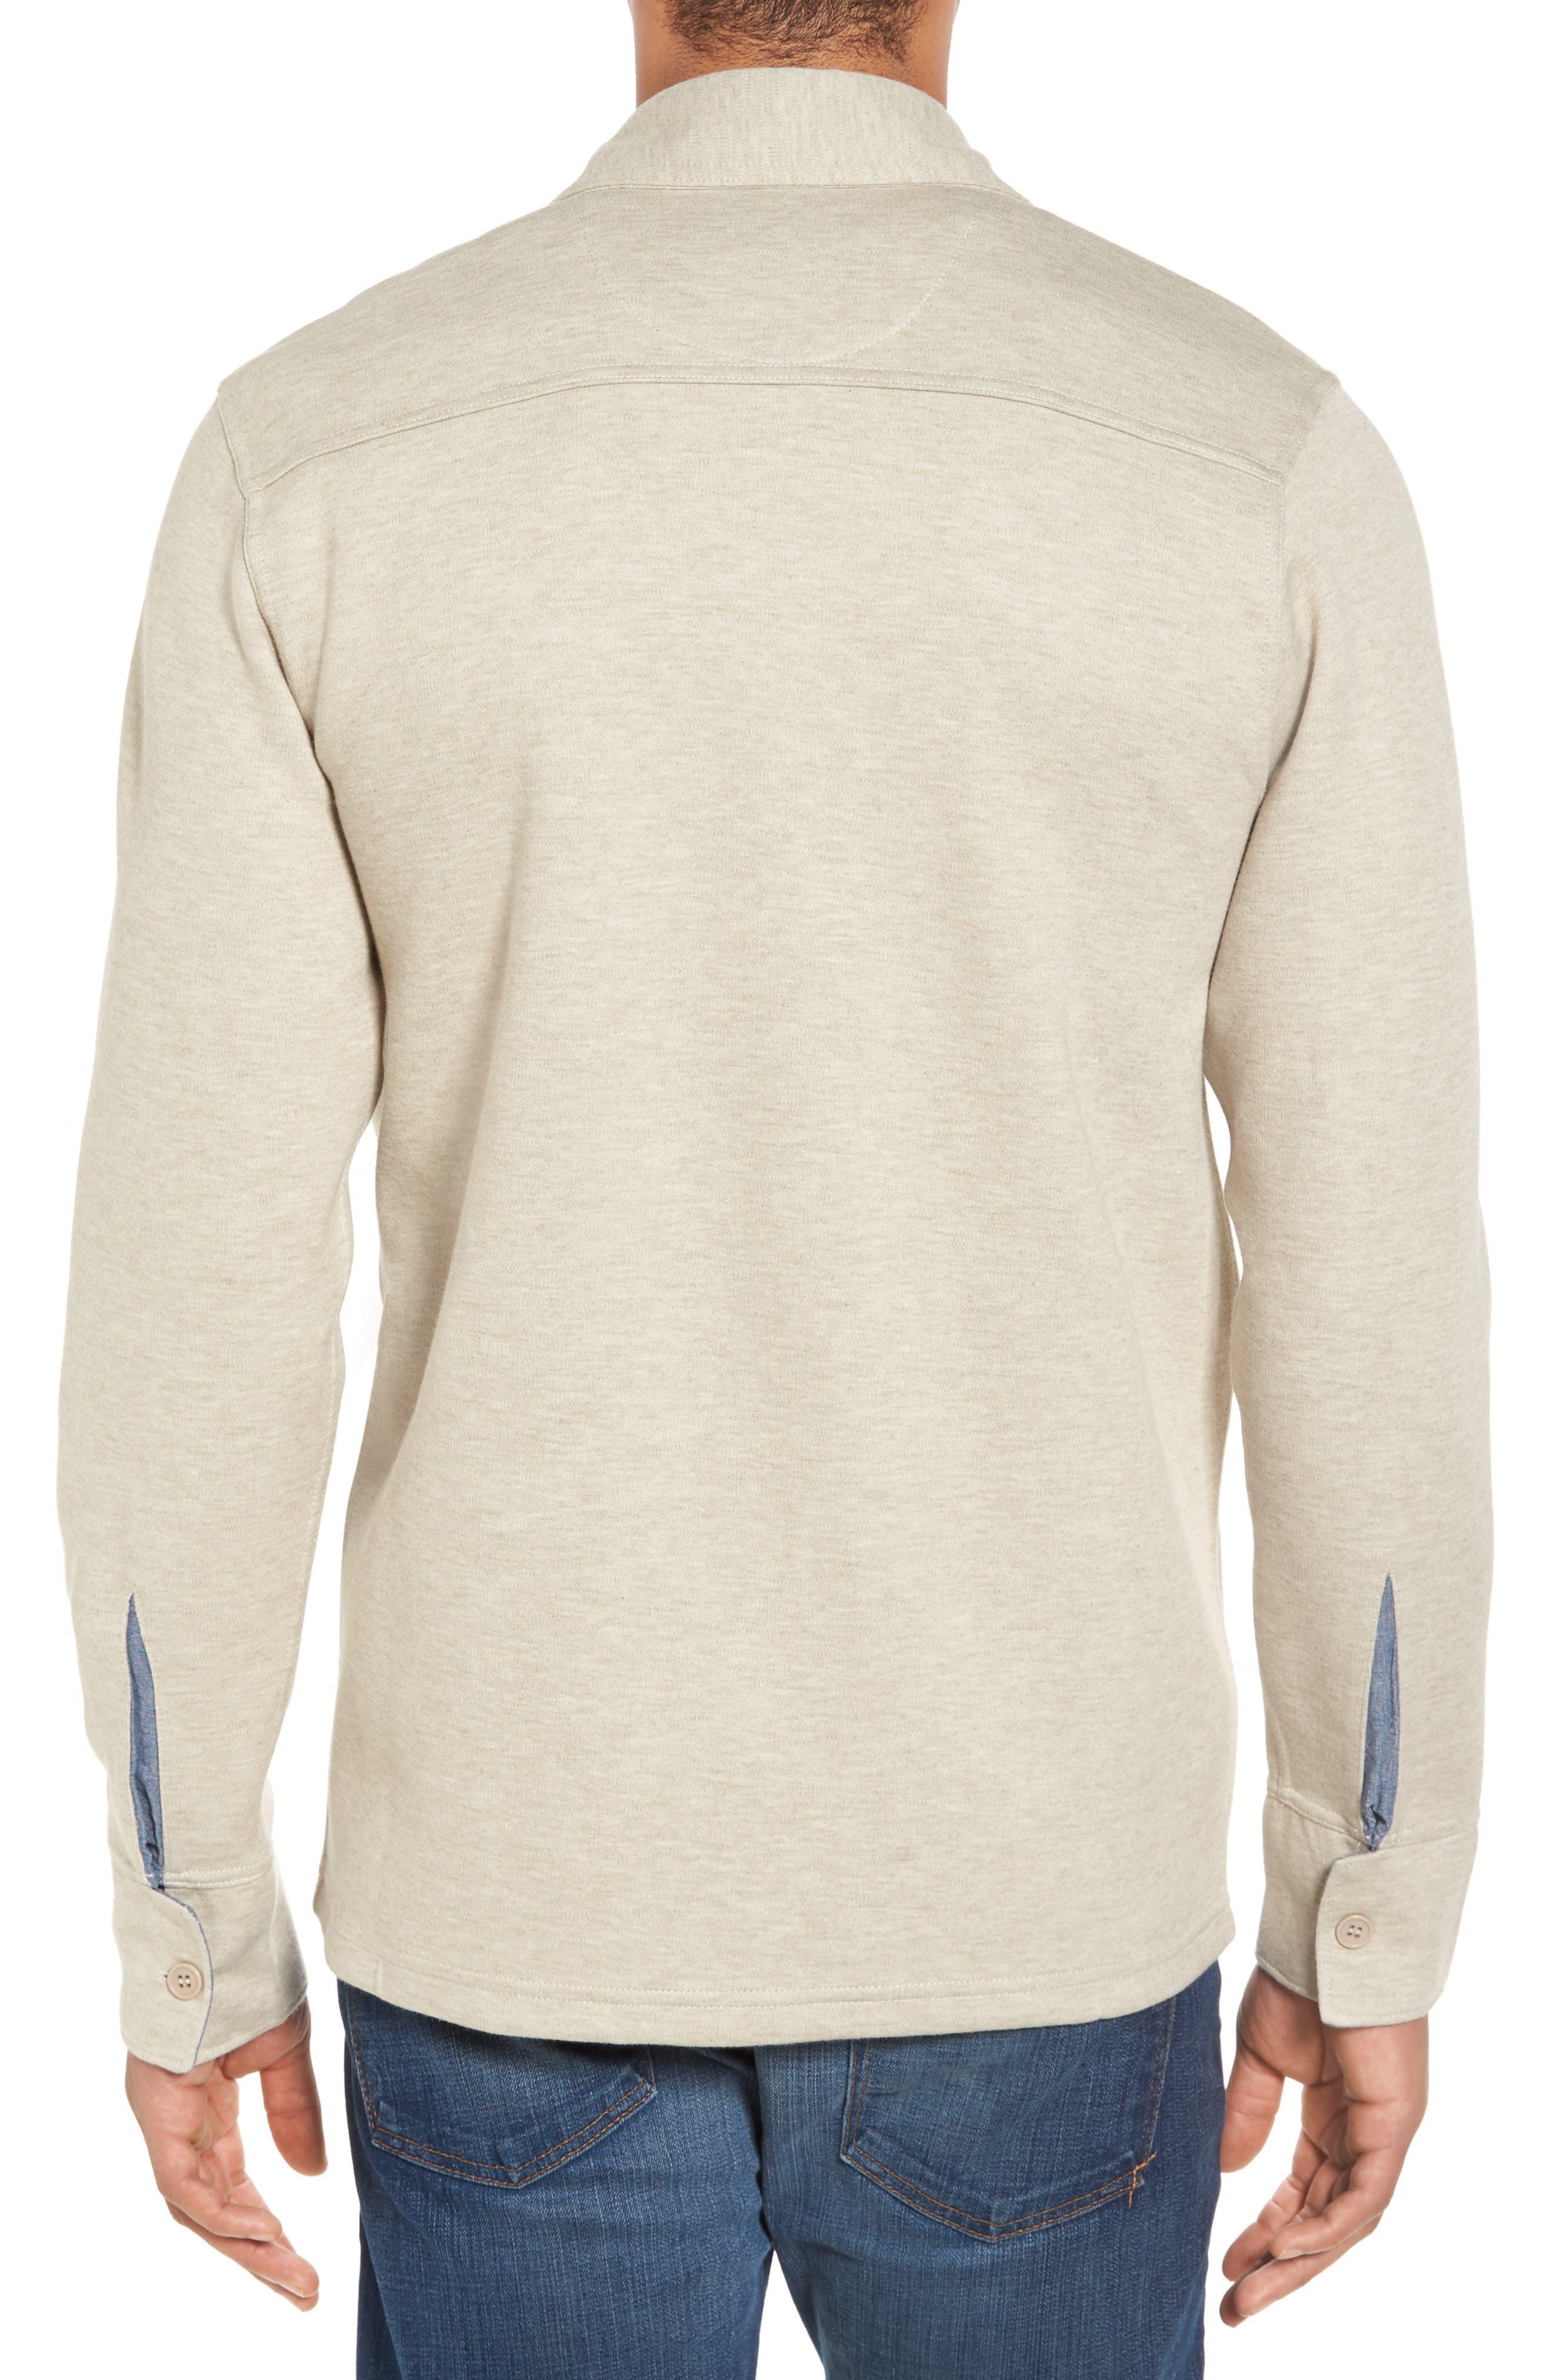 'Longitude' Flap Pocket Fleece Shirt,                             Alternate thumbnail 2, color,                             202